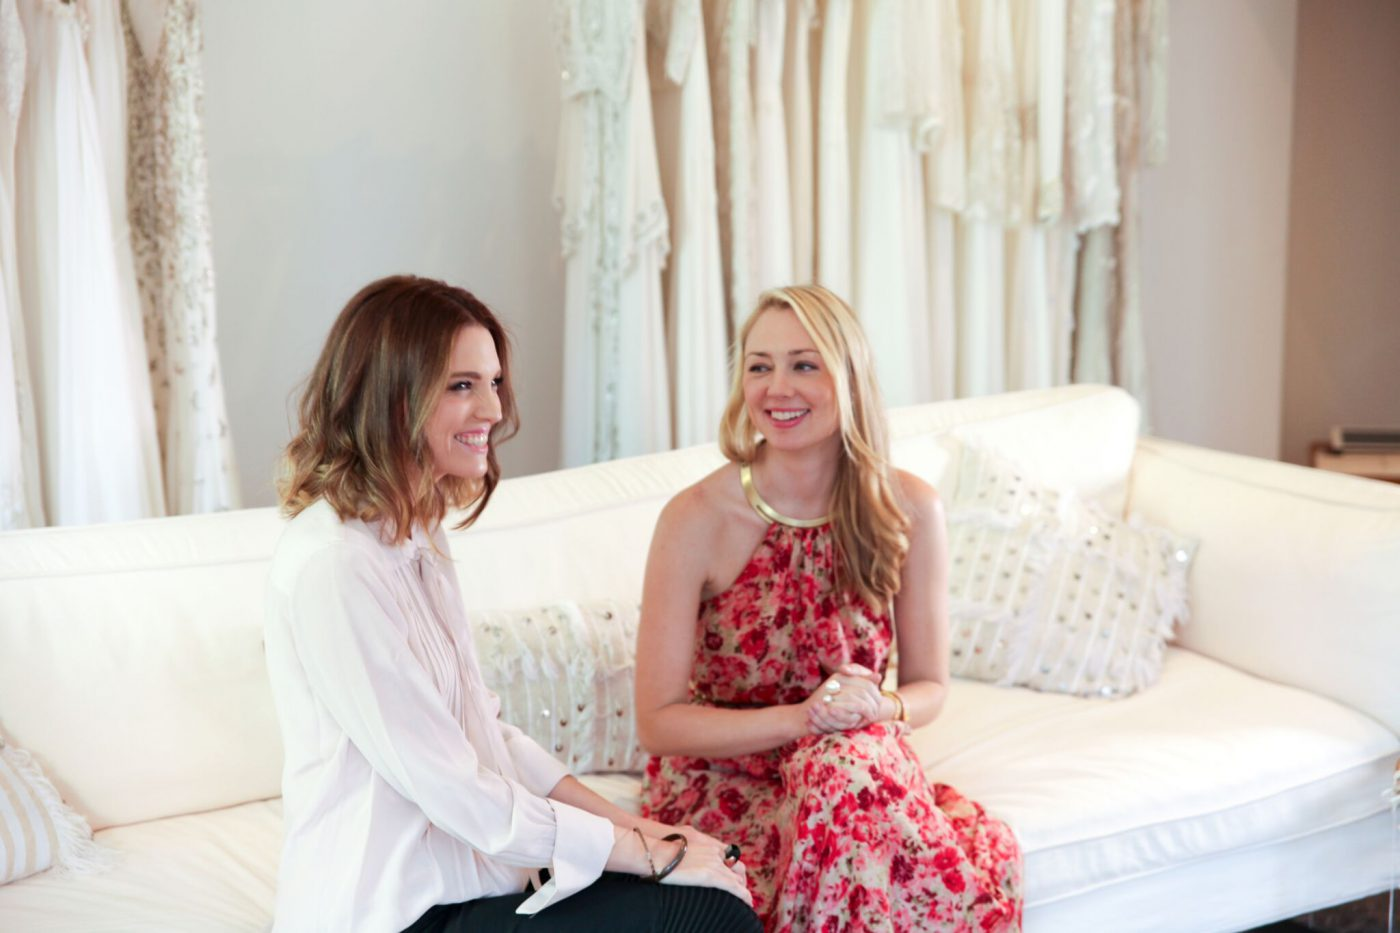 IMG_Photoshoot Entrpreneur Lis Dingjan Identity Division Brisbane Perth London Nederland Netherlands Danielle White Sugar Mama Budget Wedding Planning Sydney